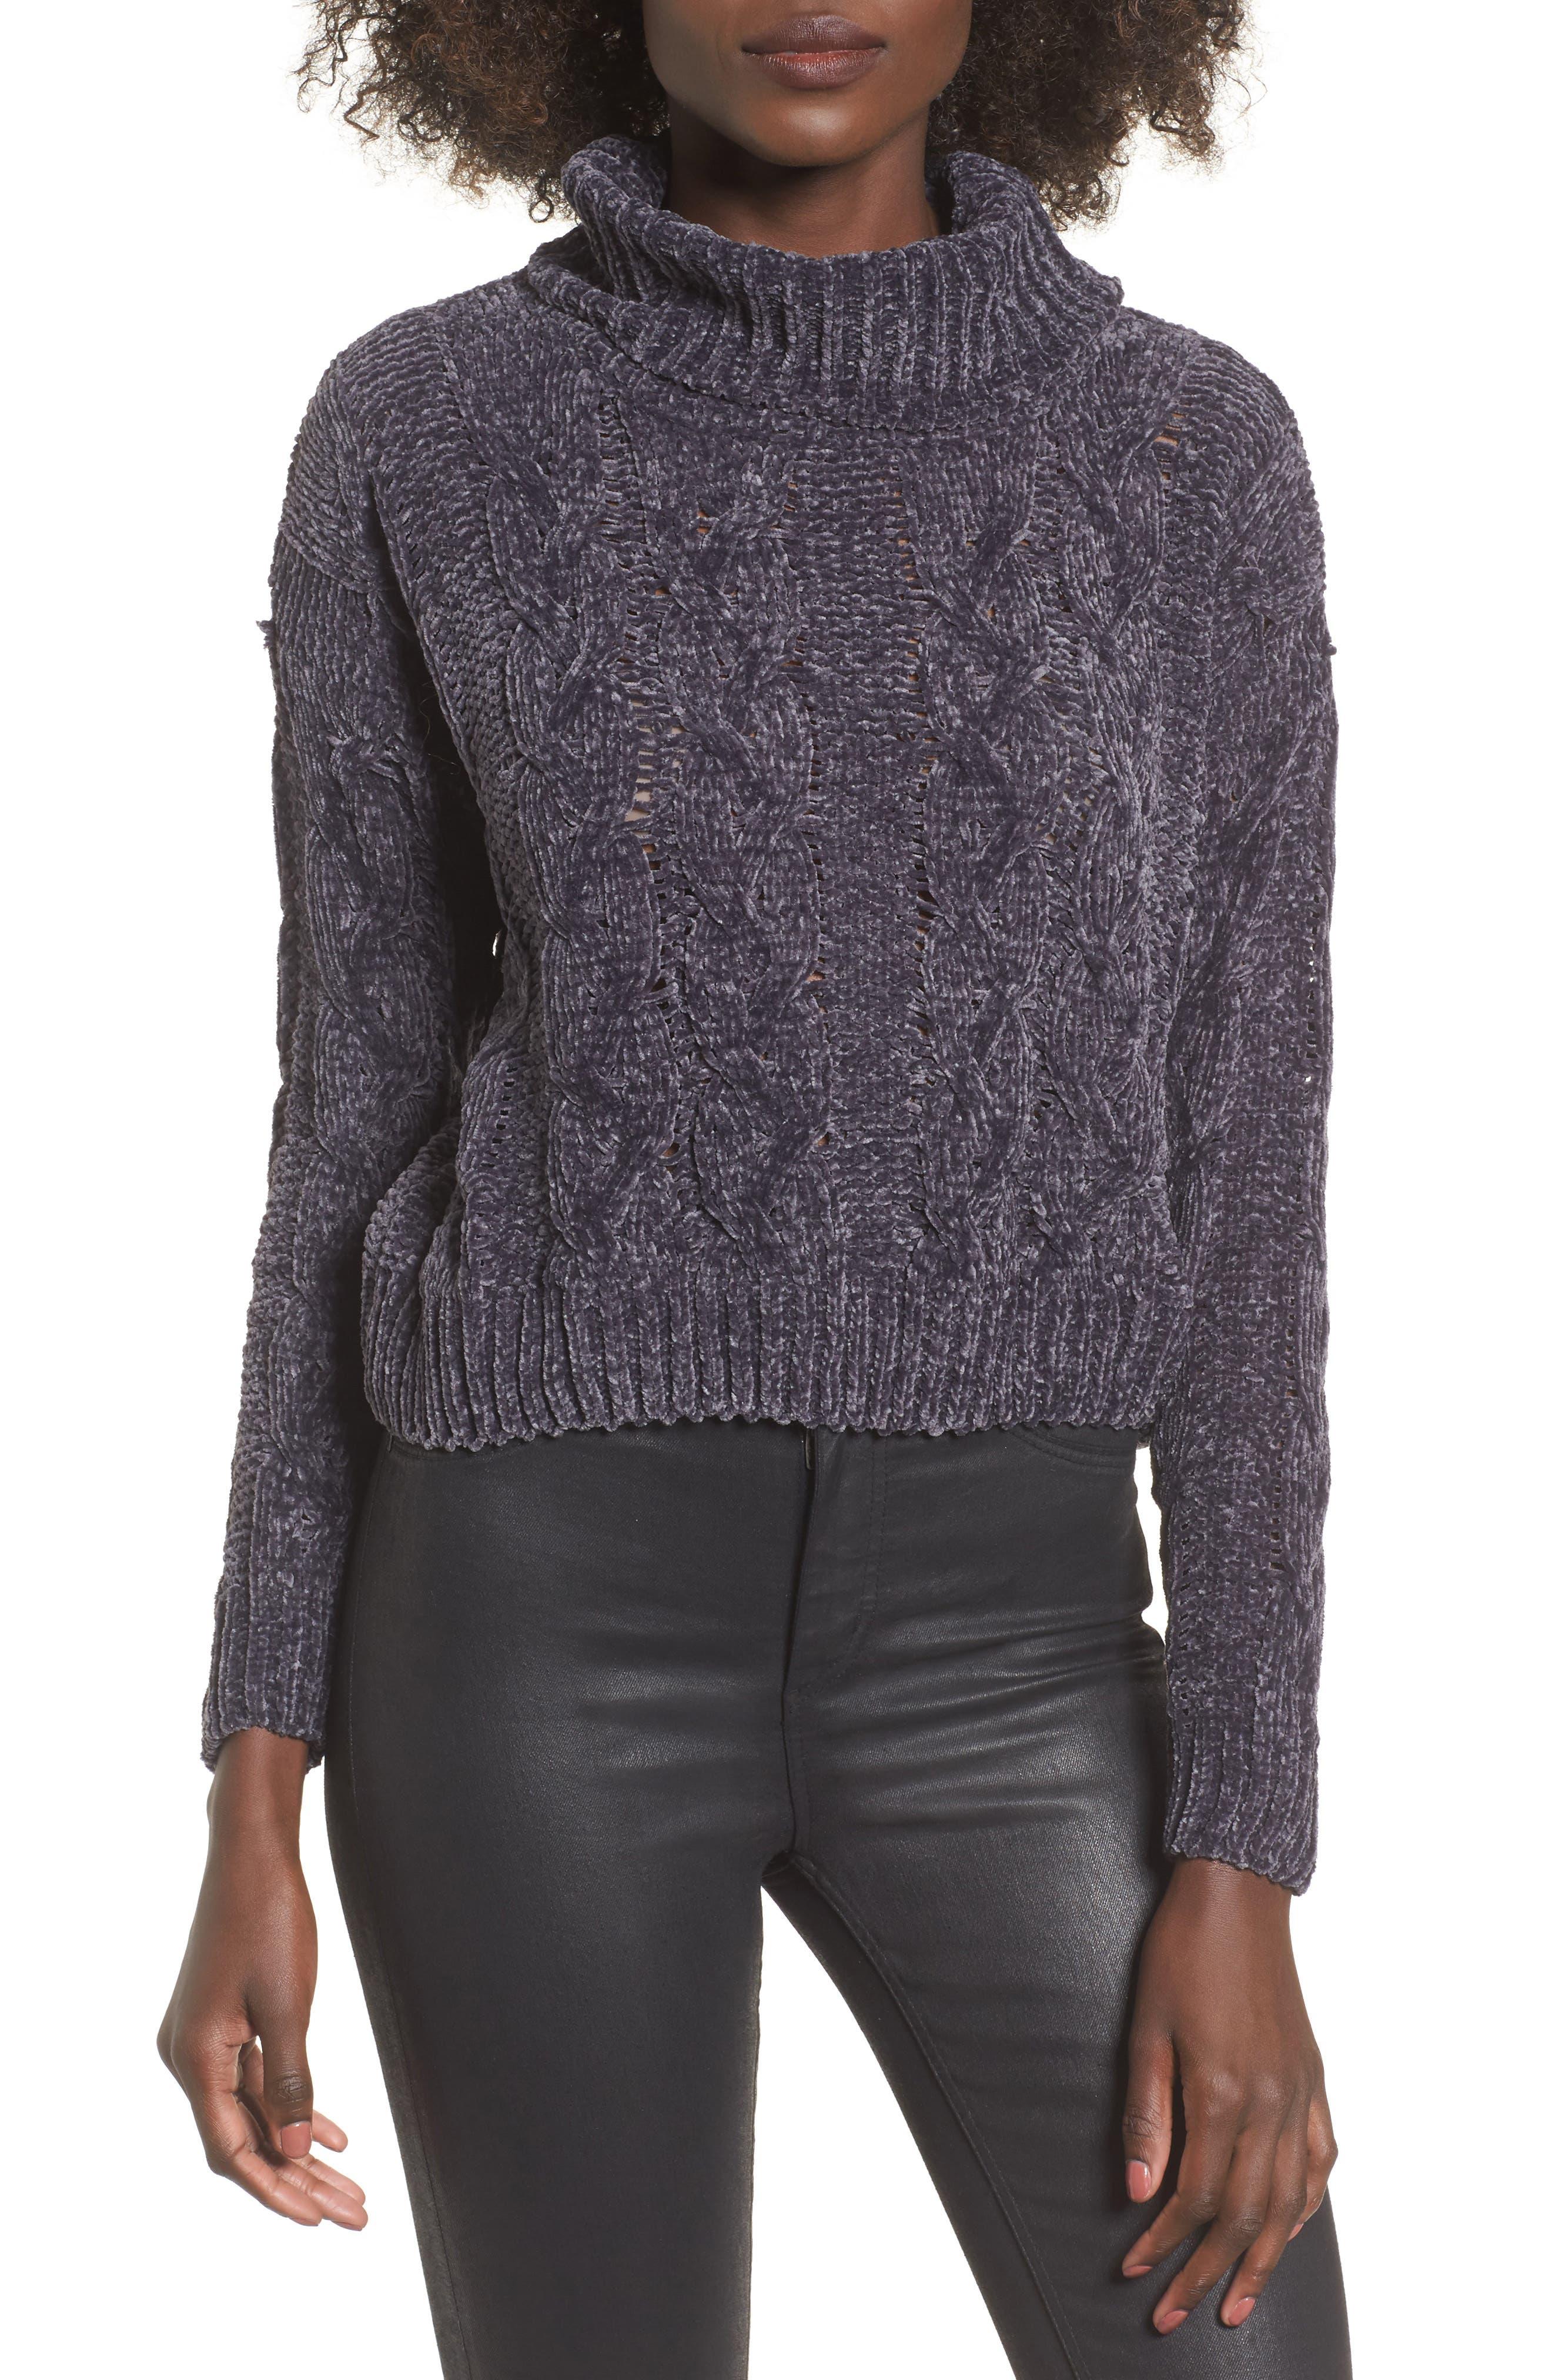 Main Image - Woven Heart Chenille Turtleneck Sweater